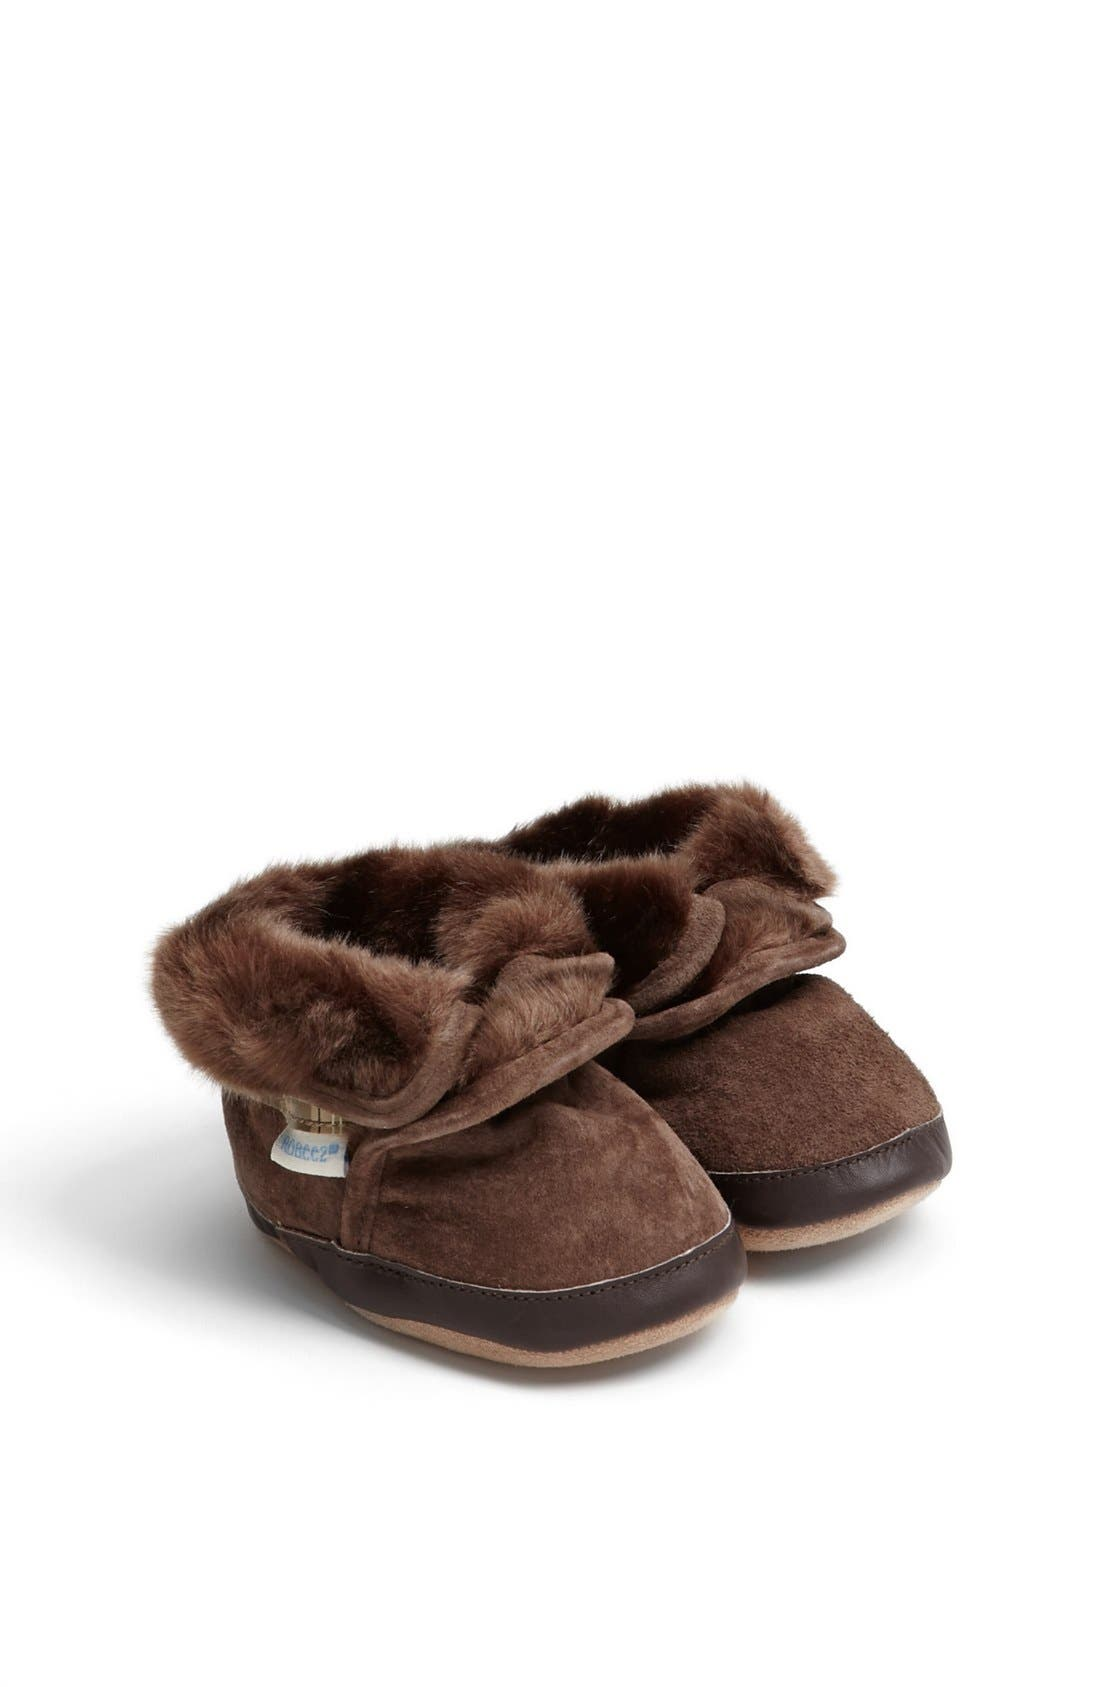 Main Image - Robeez® 'Cozy' Ankle Bootie (Baby & Walker)